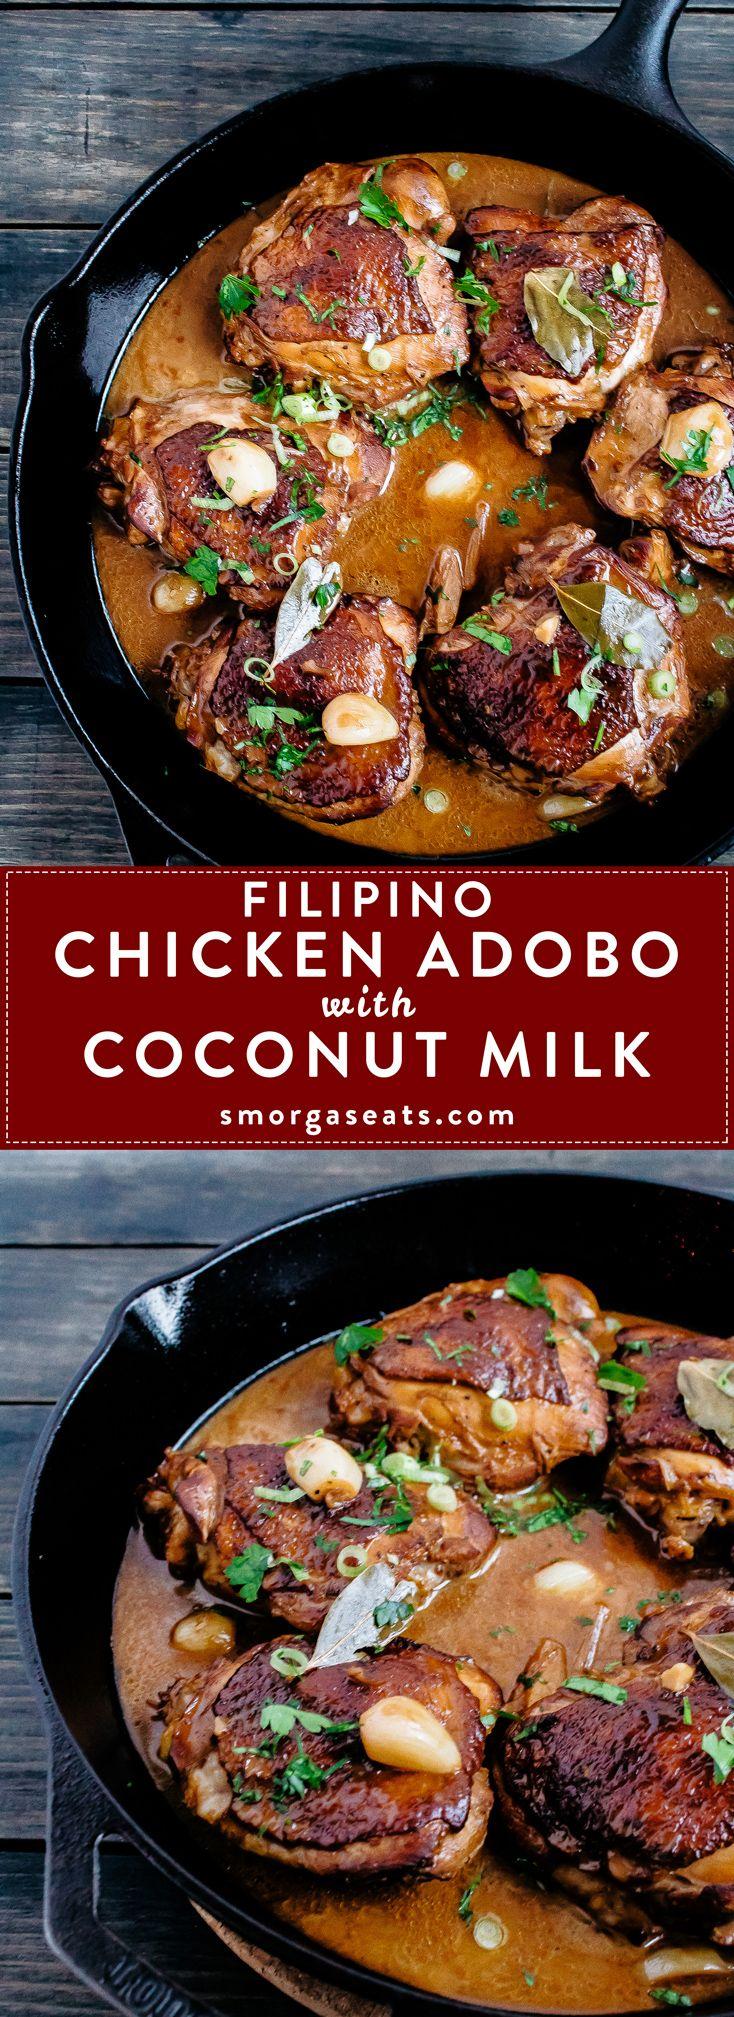 Filipino Chicken Adobo with Coconut Milk